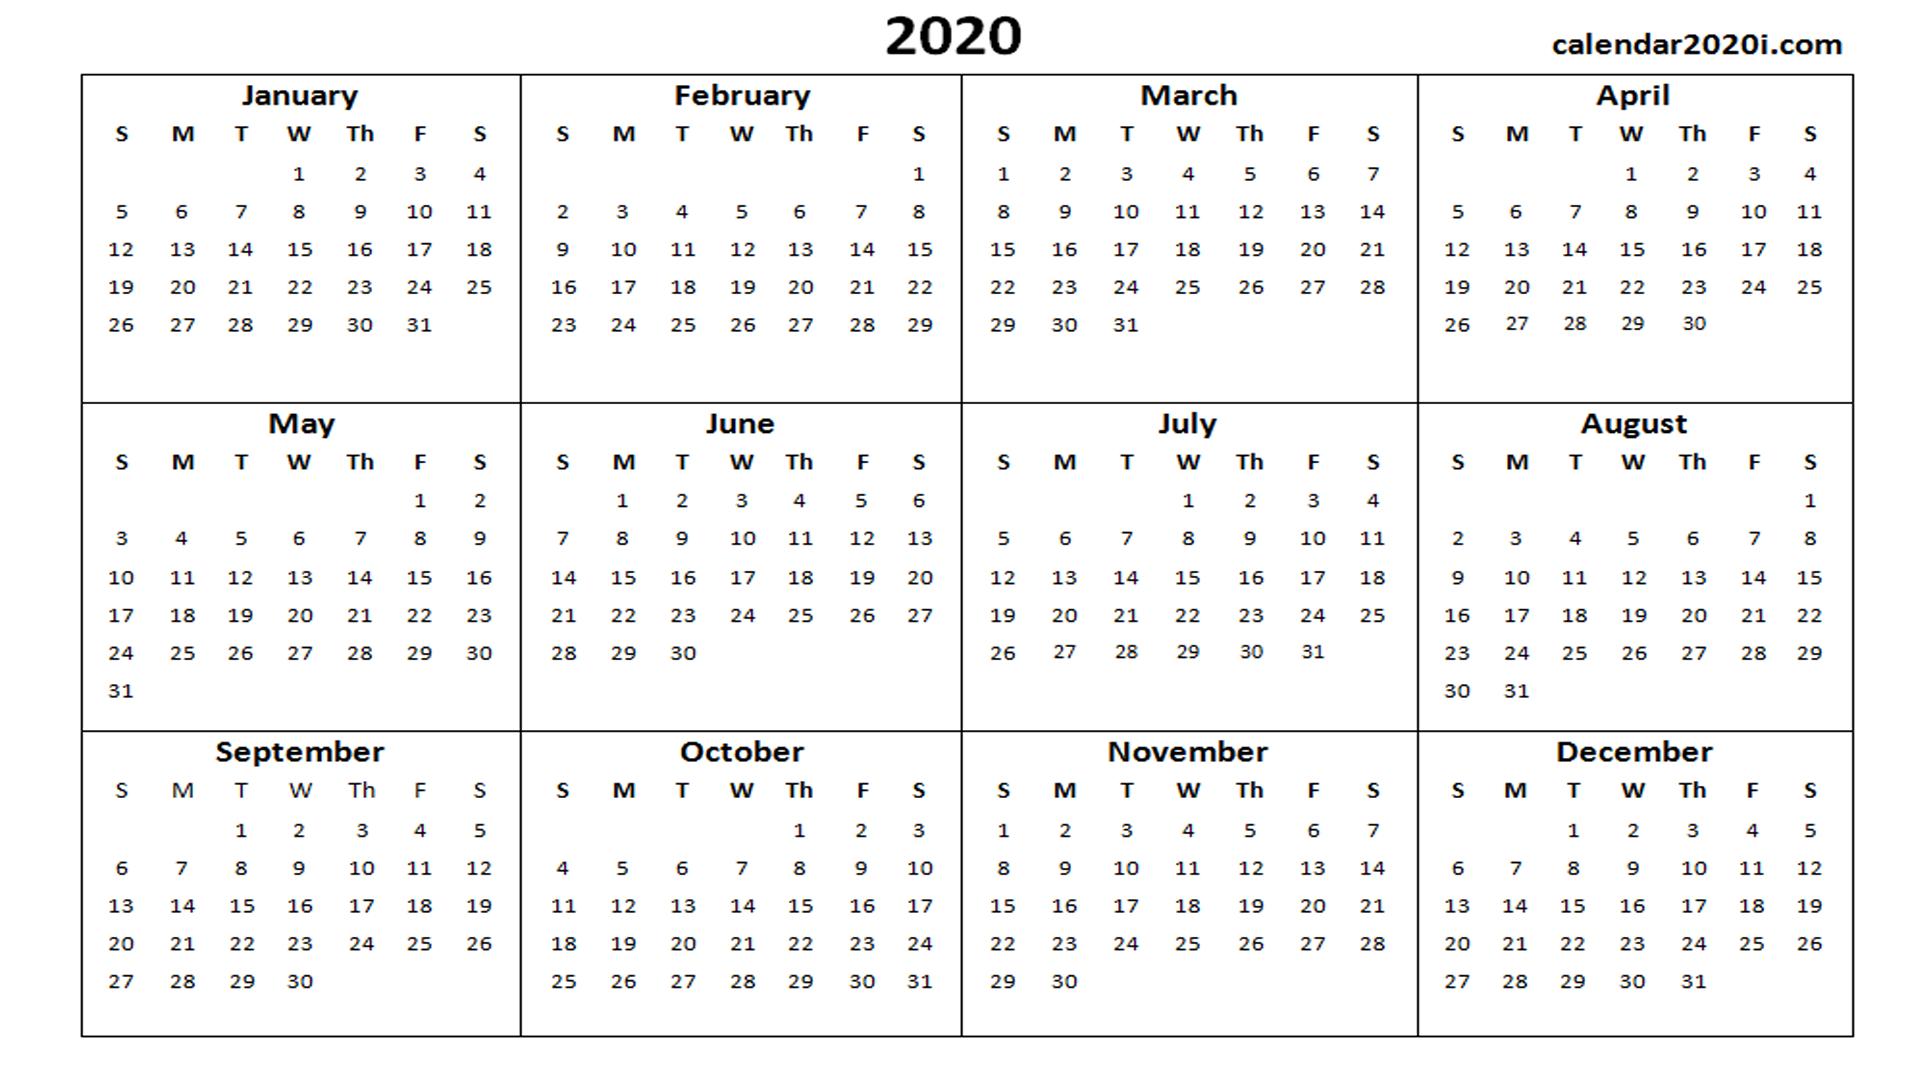 2020 Calendar Printable Template Holidays, Word, Excel, Pdf for 2020 Excel Calendar